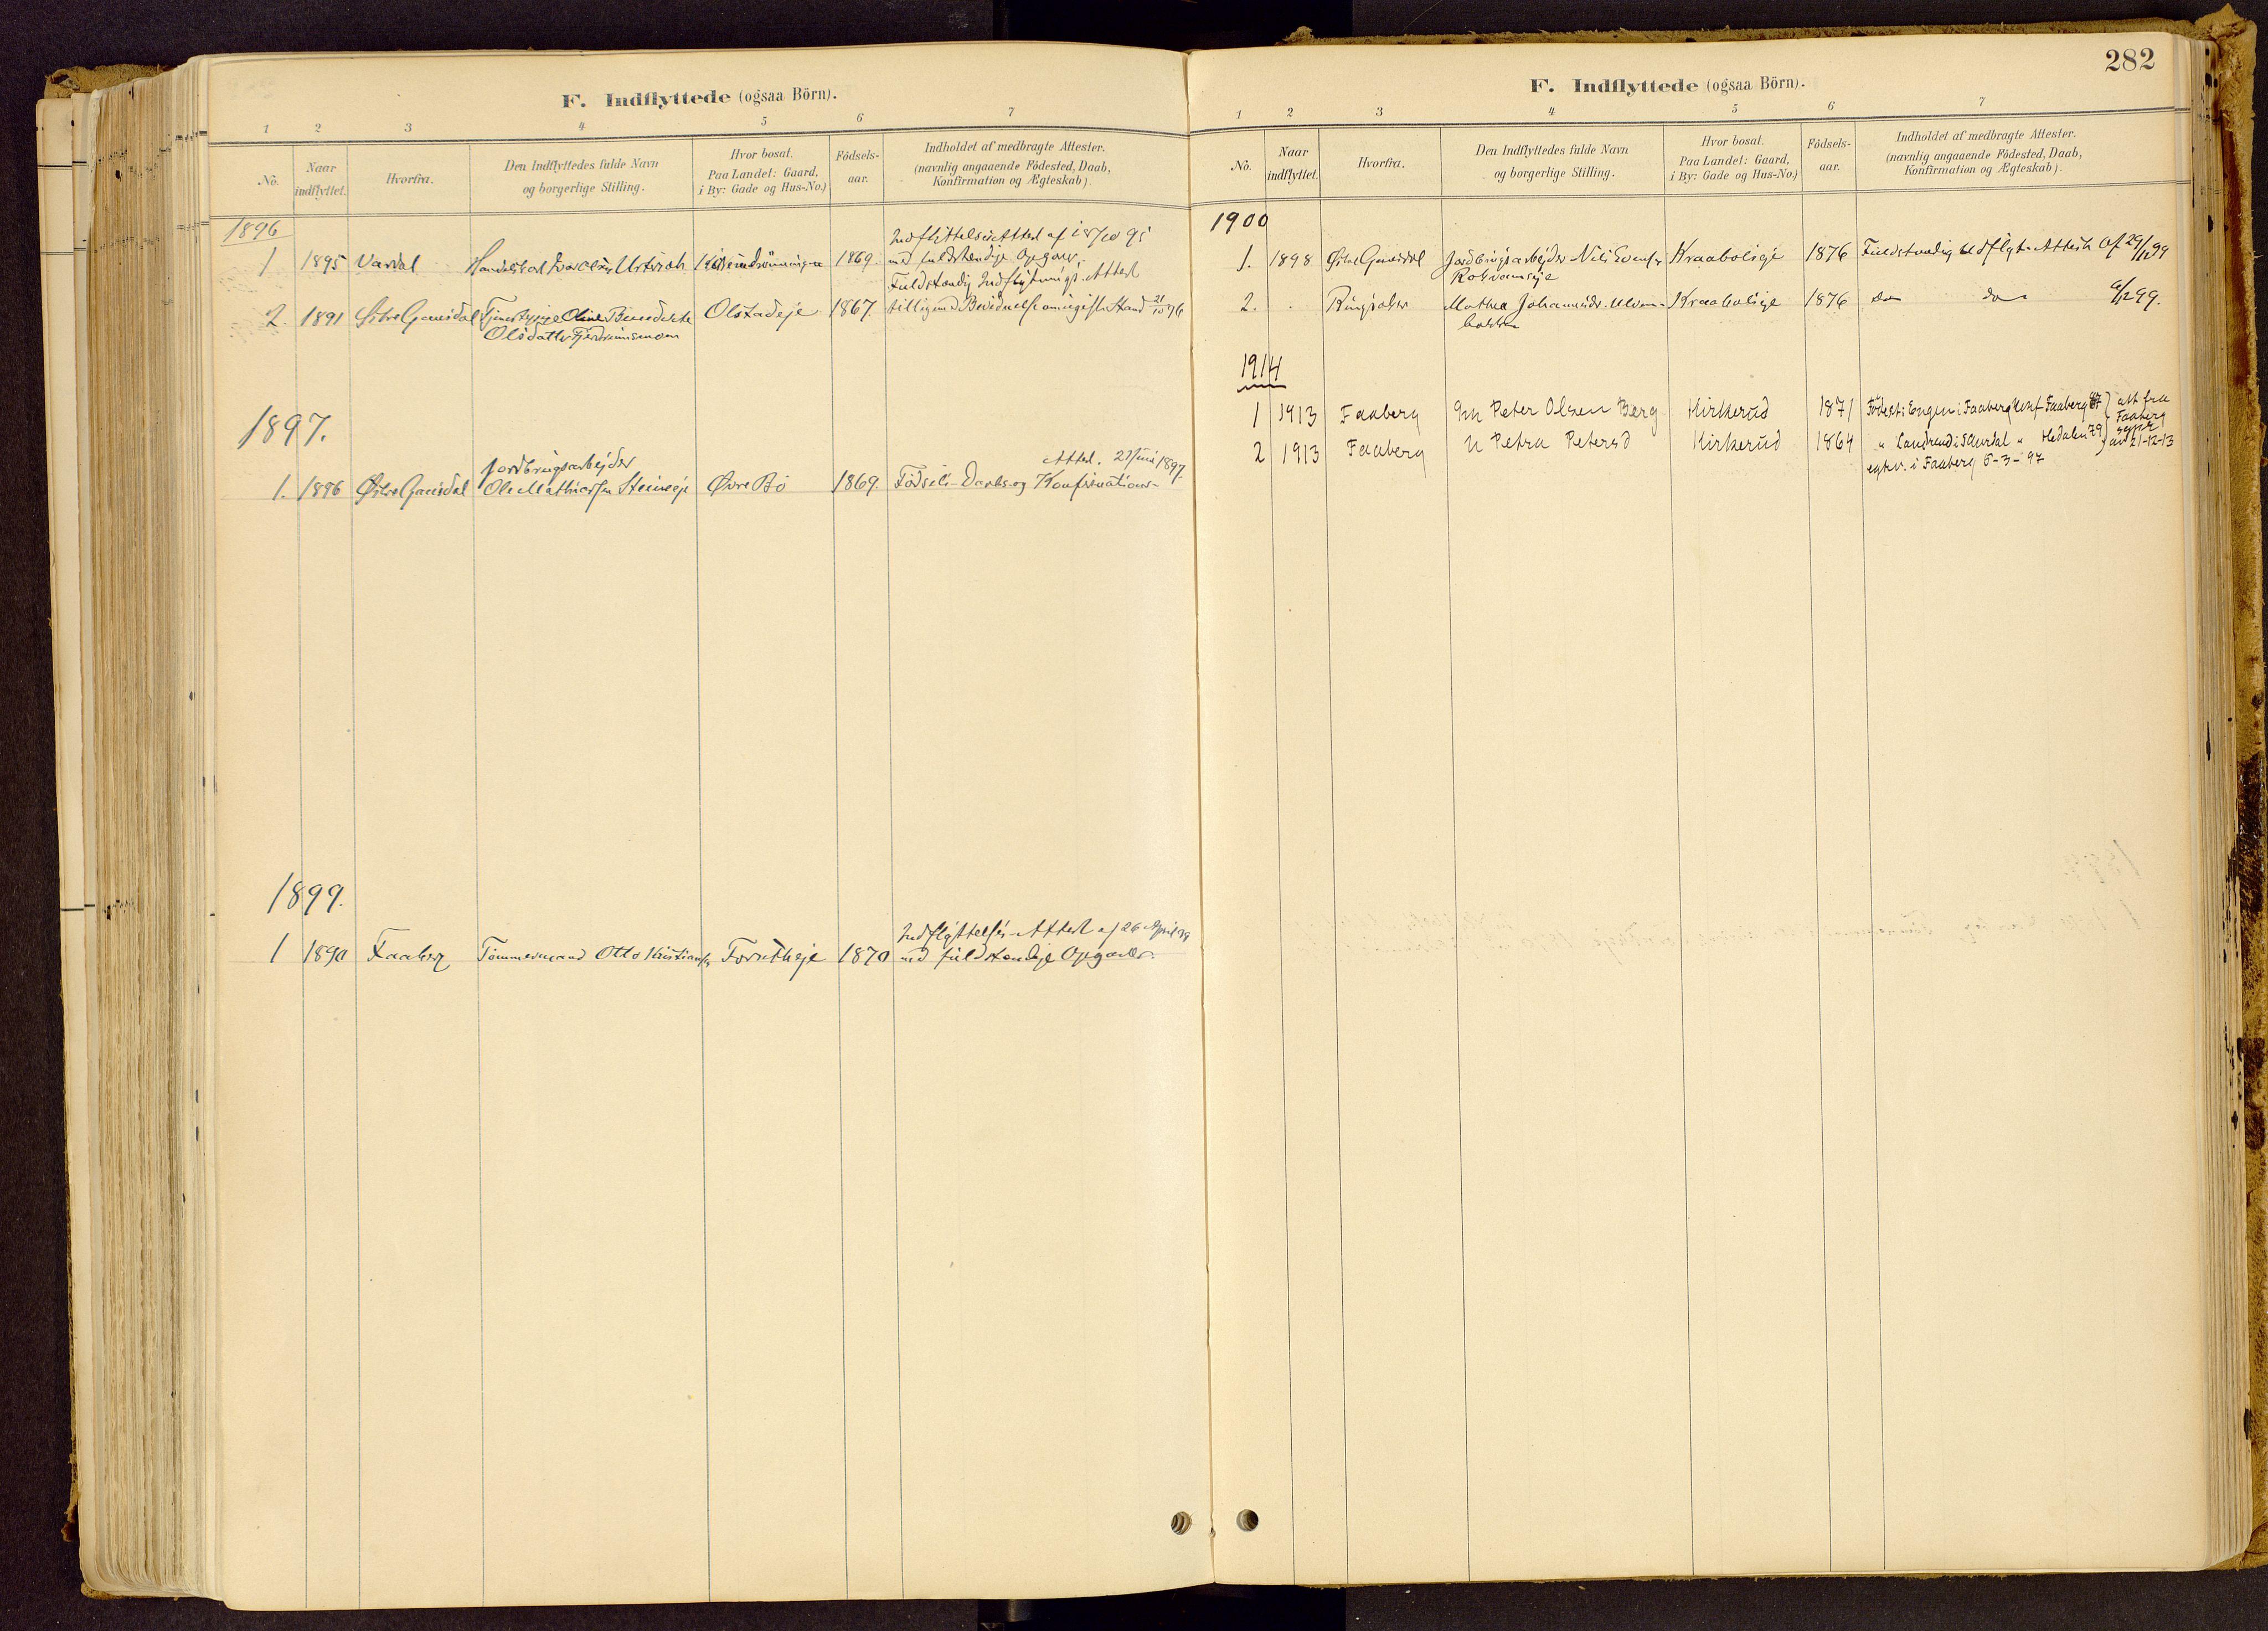 SAH, Vestre Gausdal prestekontor, Ministerialbok nr. 1, 1887-1914, s. 282